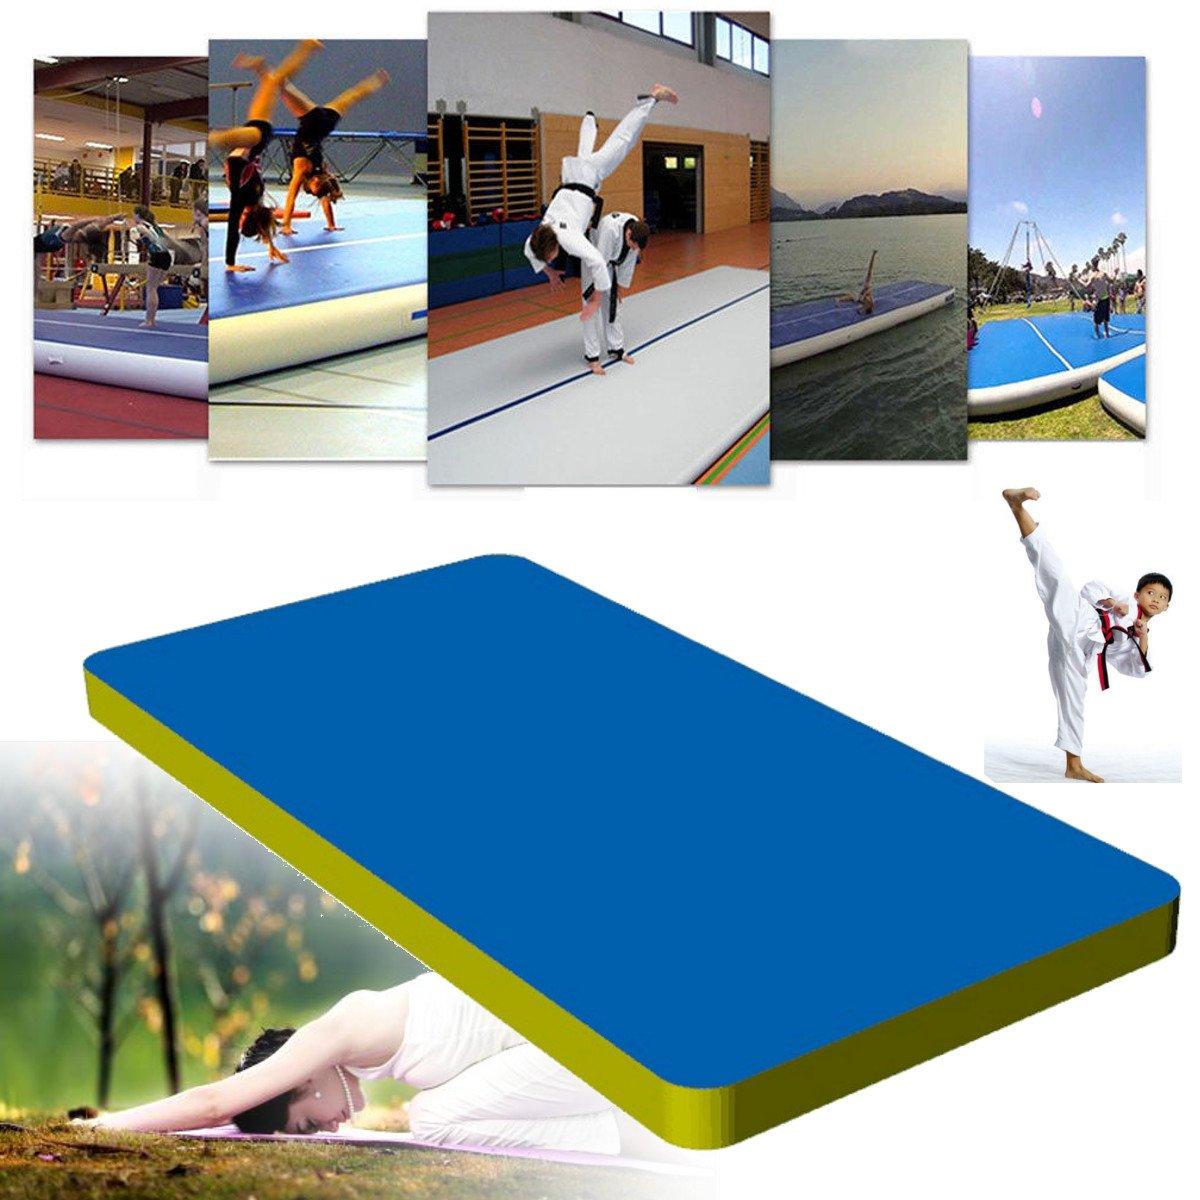 Spessore 20cm 4//5//6m Air Track Da Ginnastica Tappetino Tumbling GONFIABILI turn Tappetino POMPA